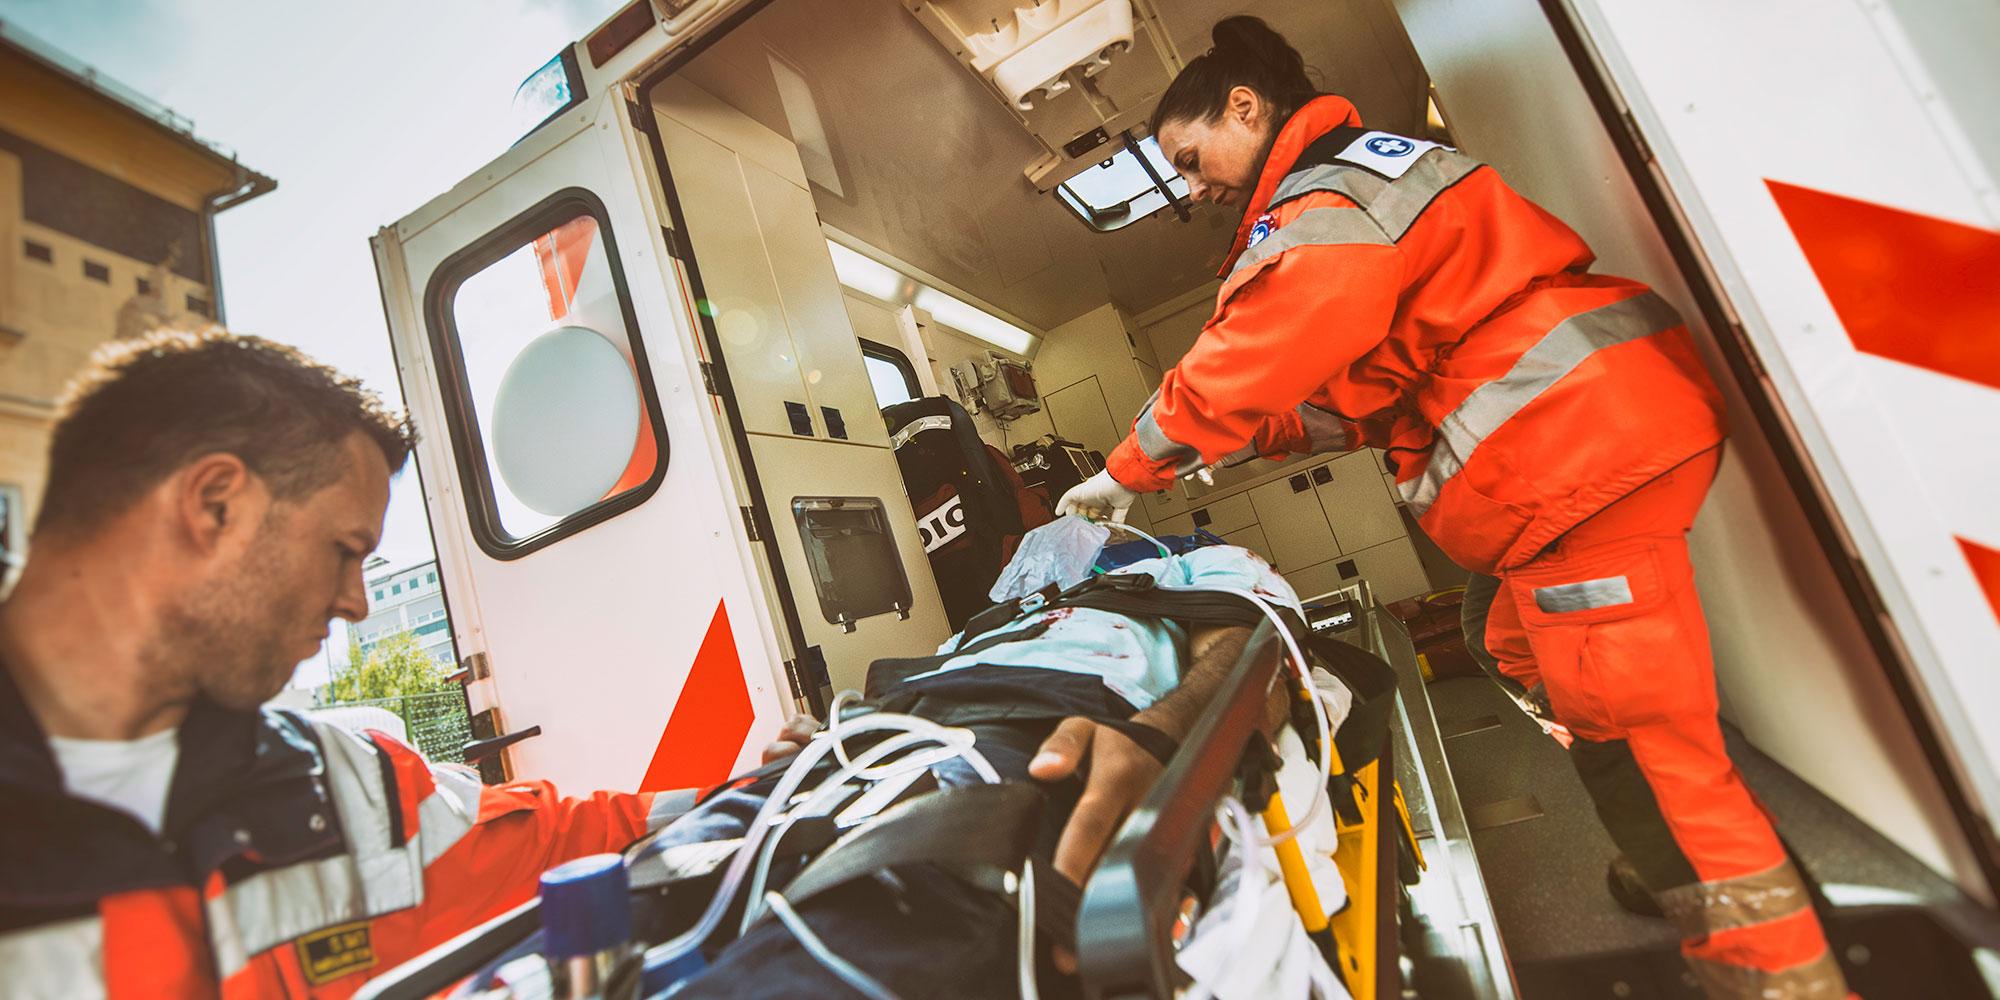 image of paramedics loading a patient into an ambulance